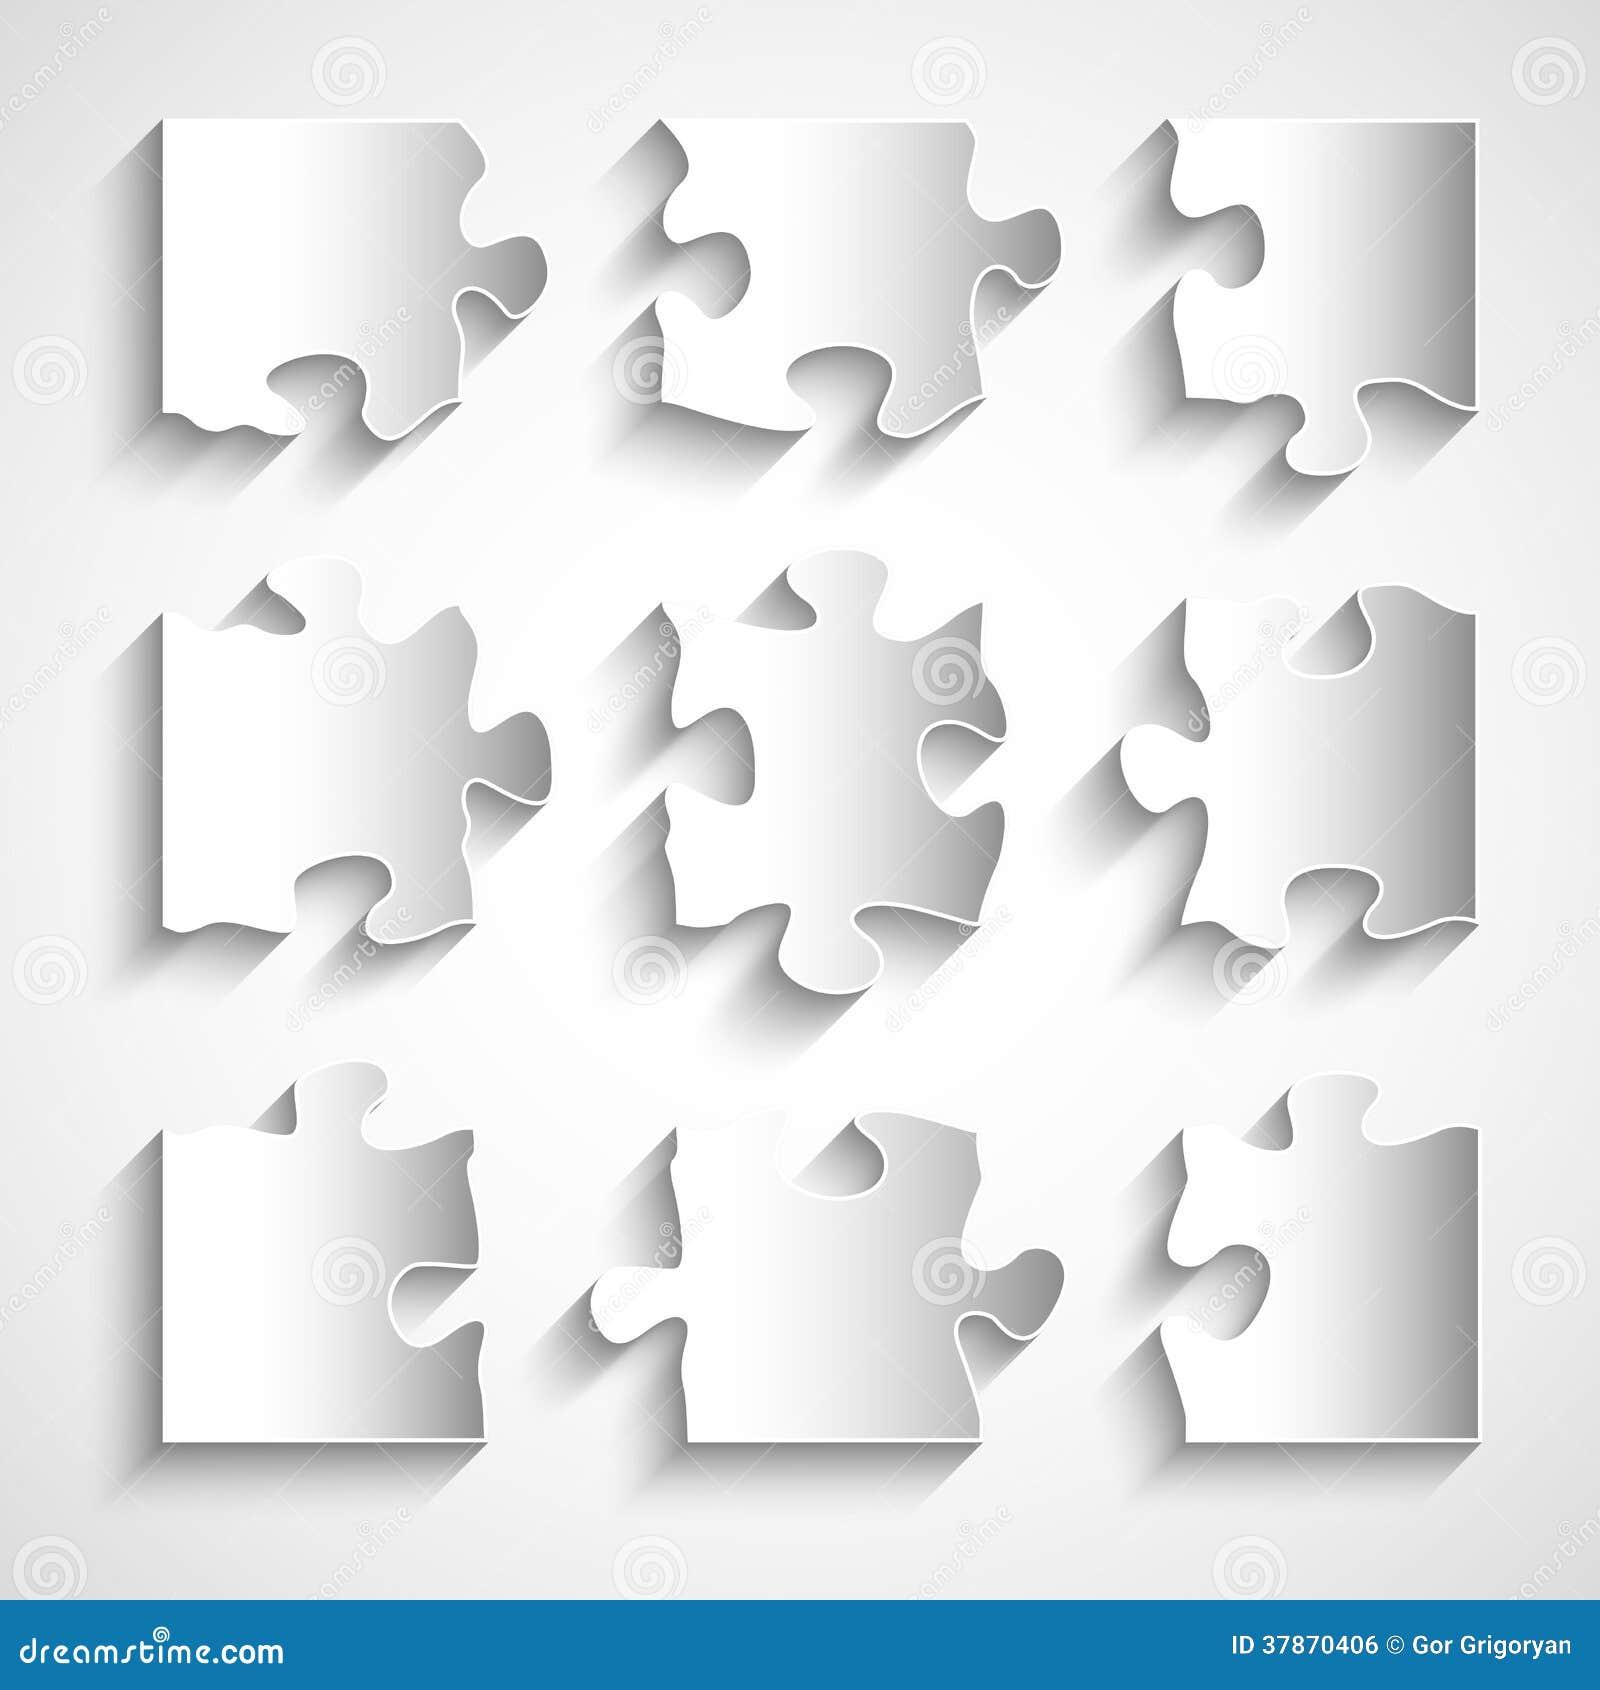 puzzle piece pattern - Vatoz.atozdevelopment.co